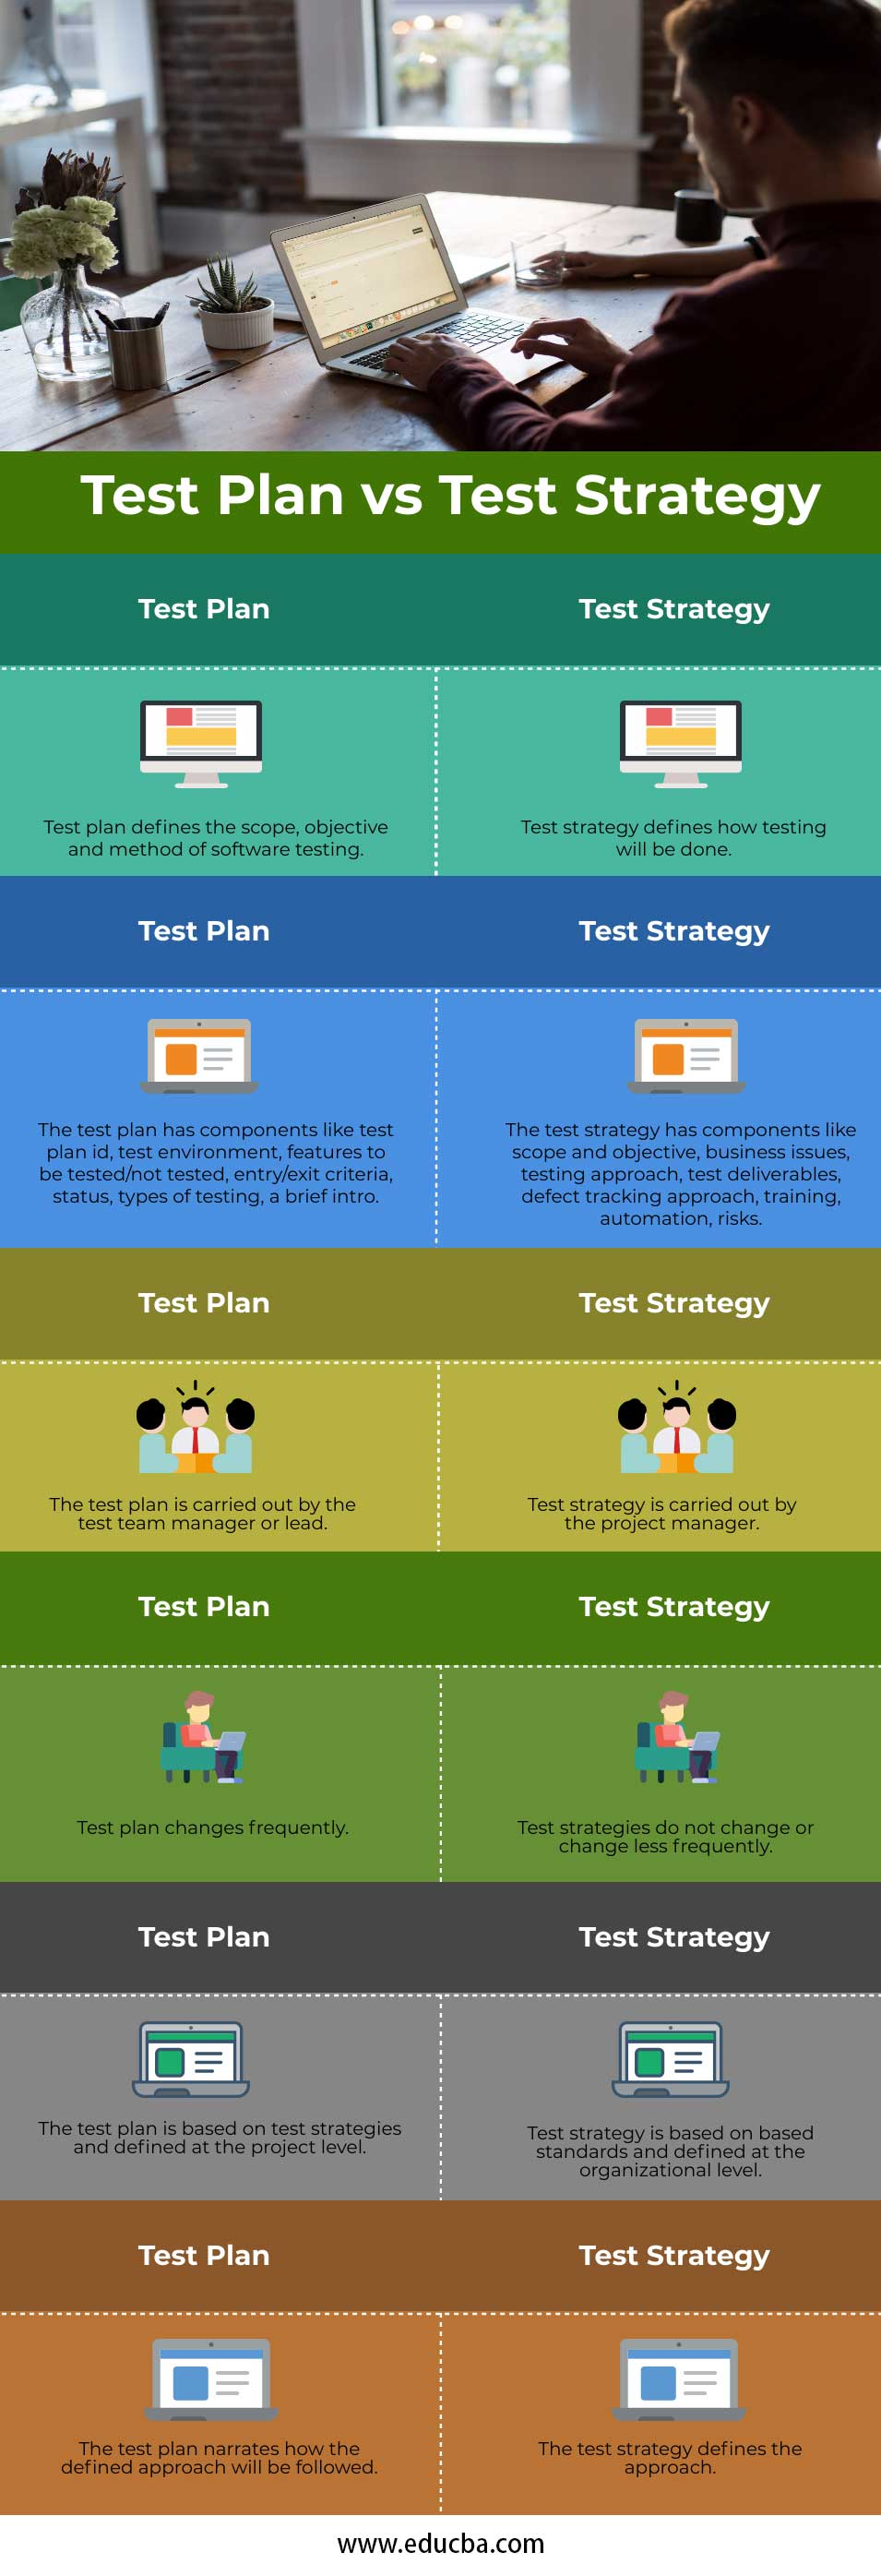 Test Plan vs Test Strategy Info